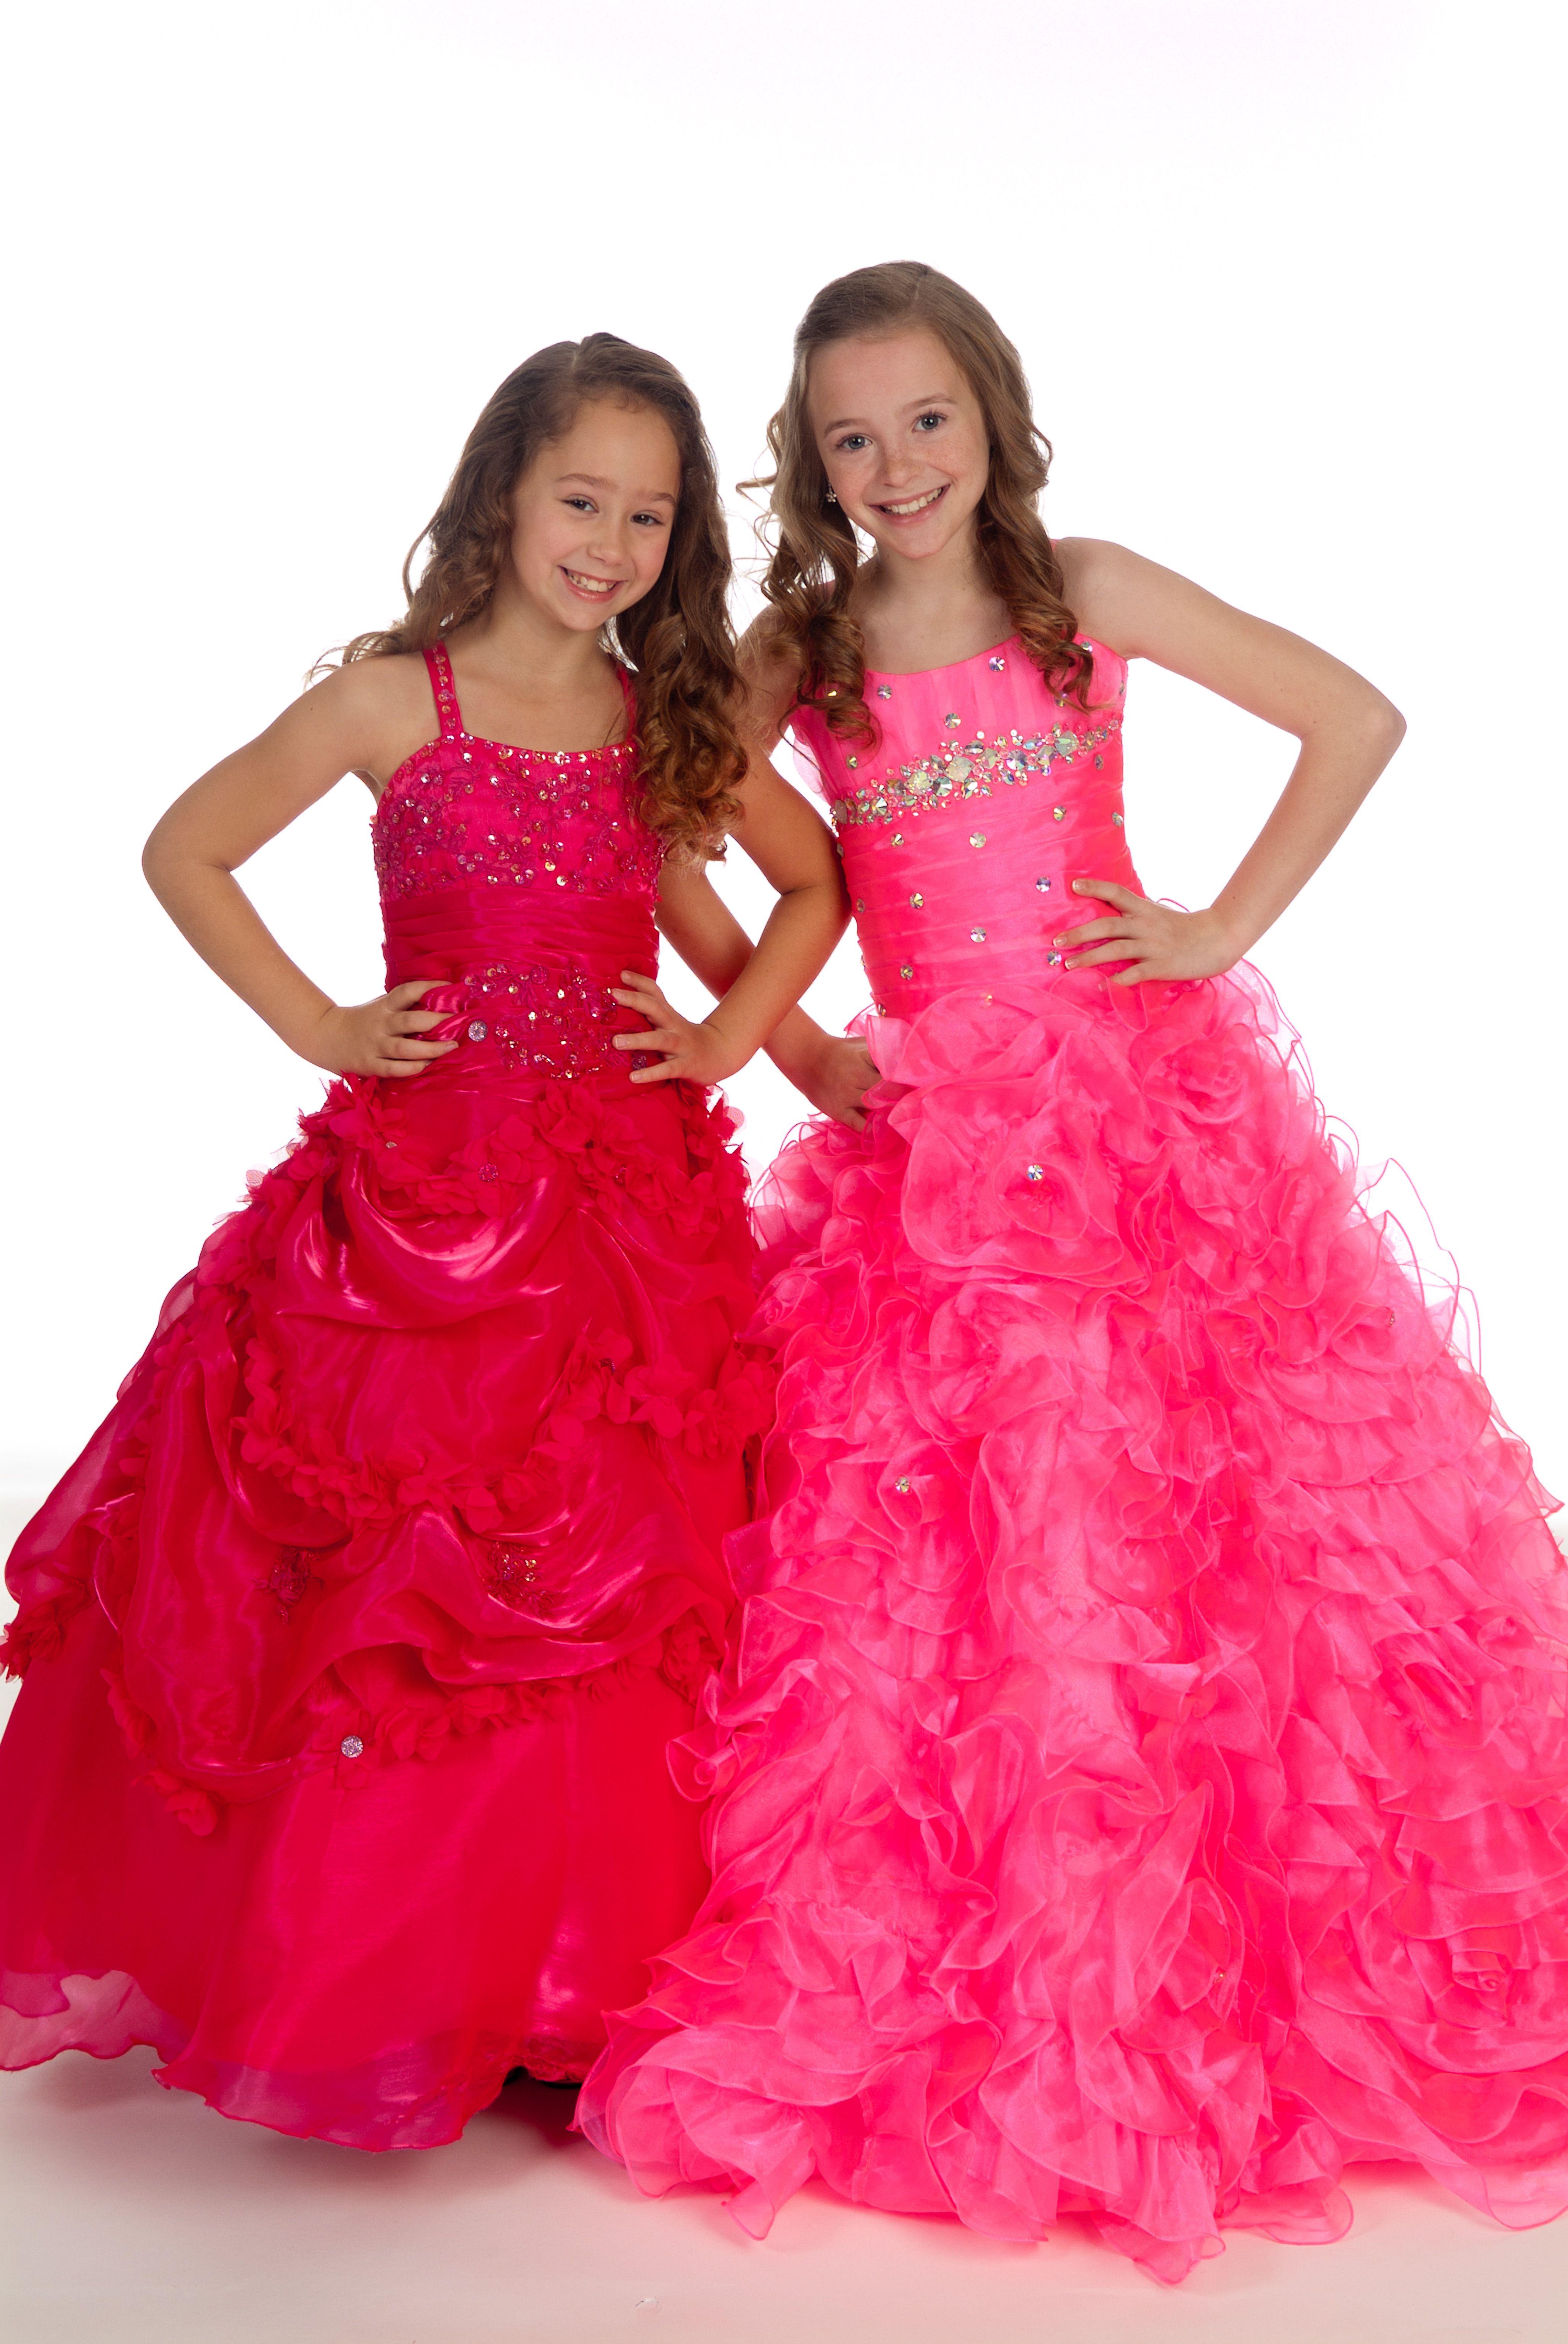 Pageant dress | Formal Wear | Pinterest | Prinzessinnenkleider ...